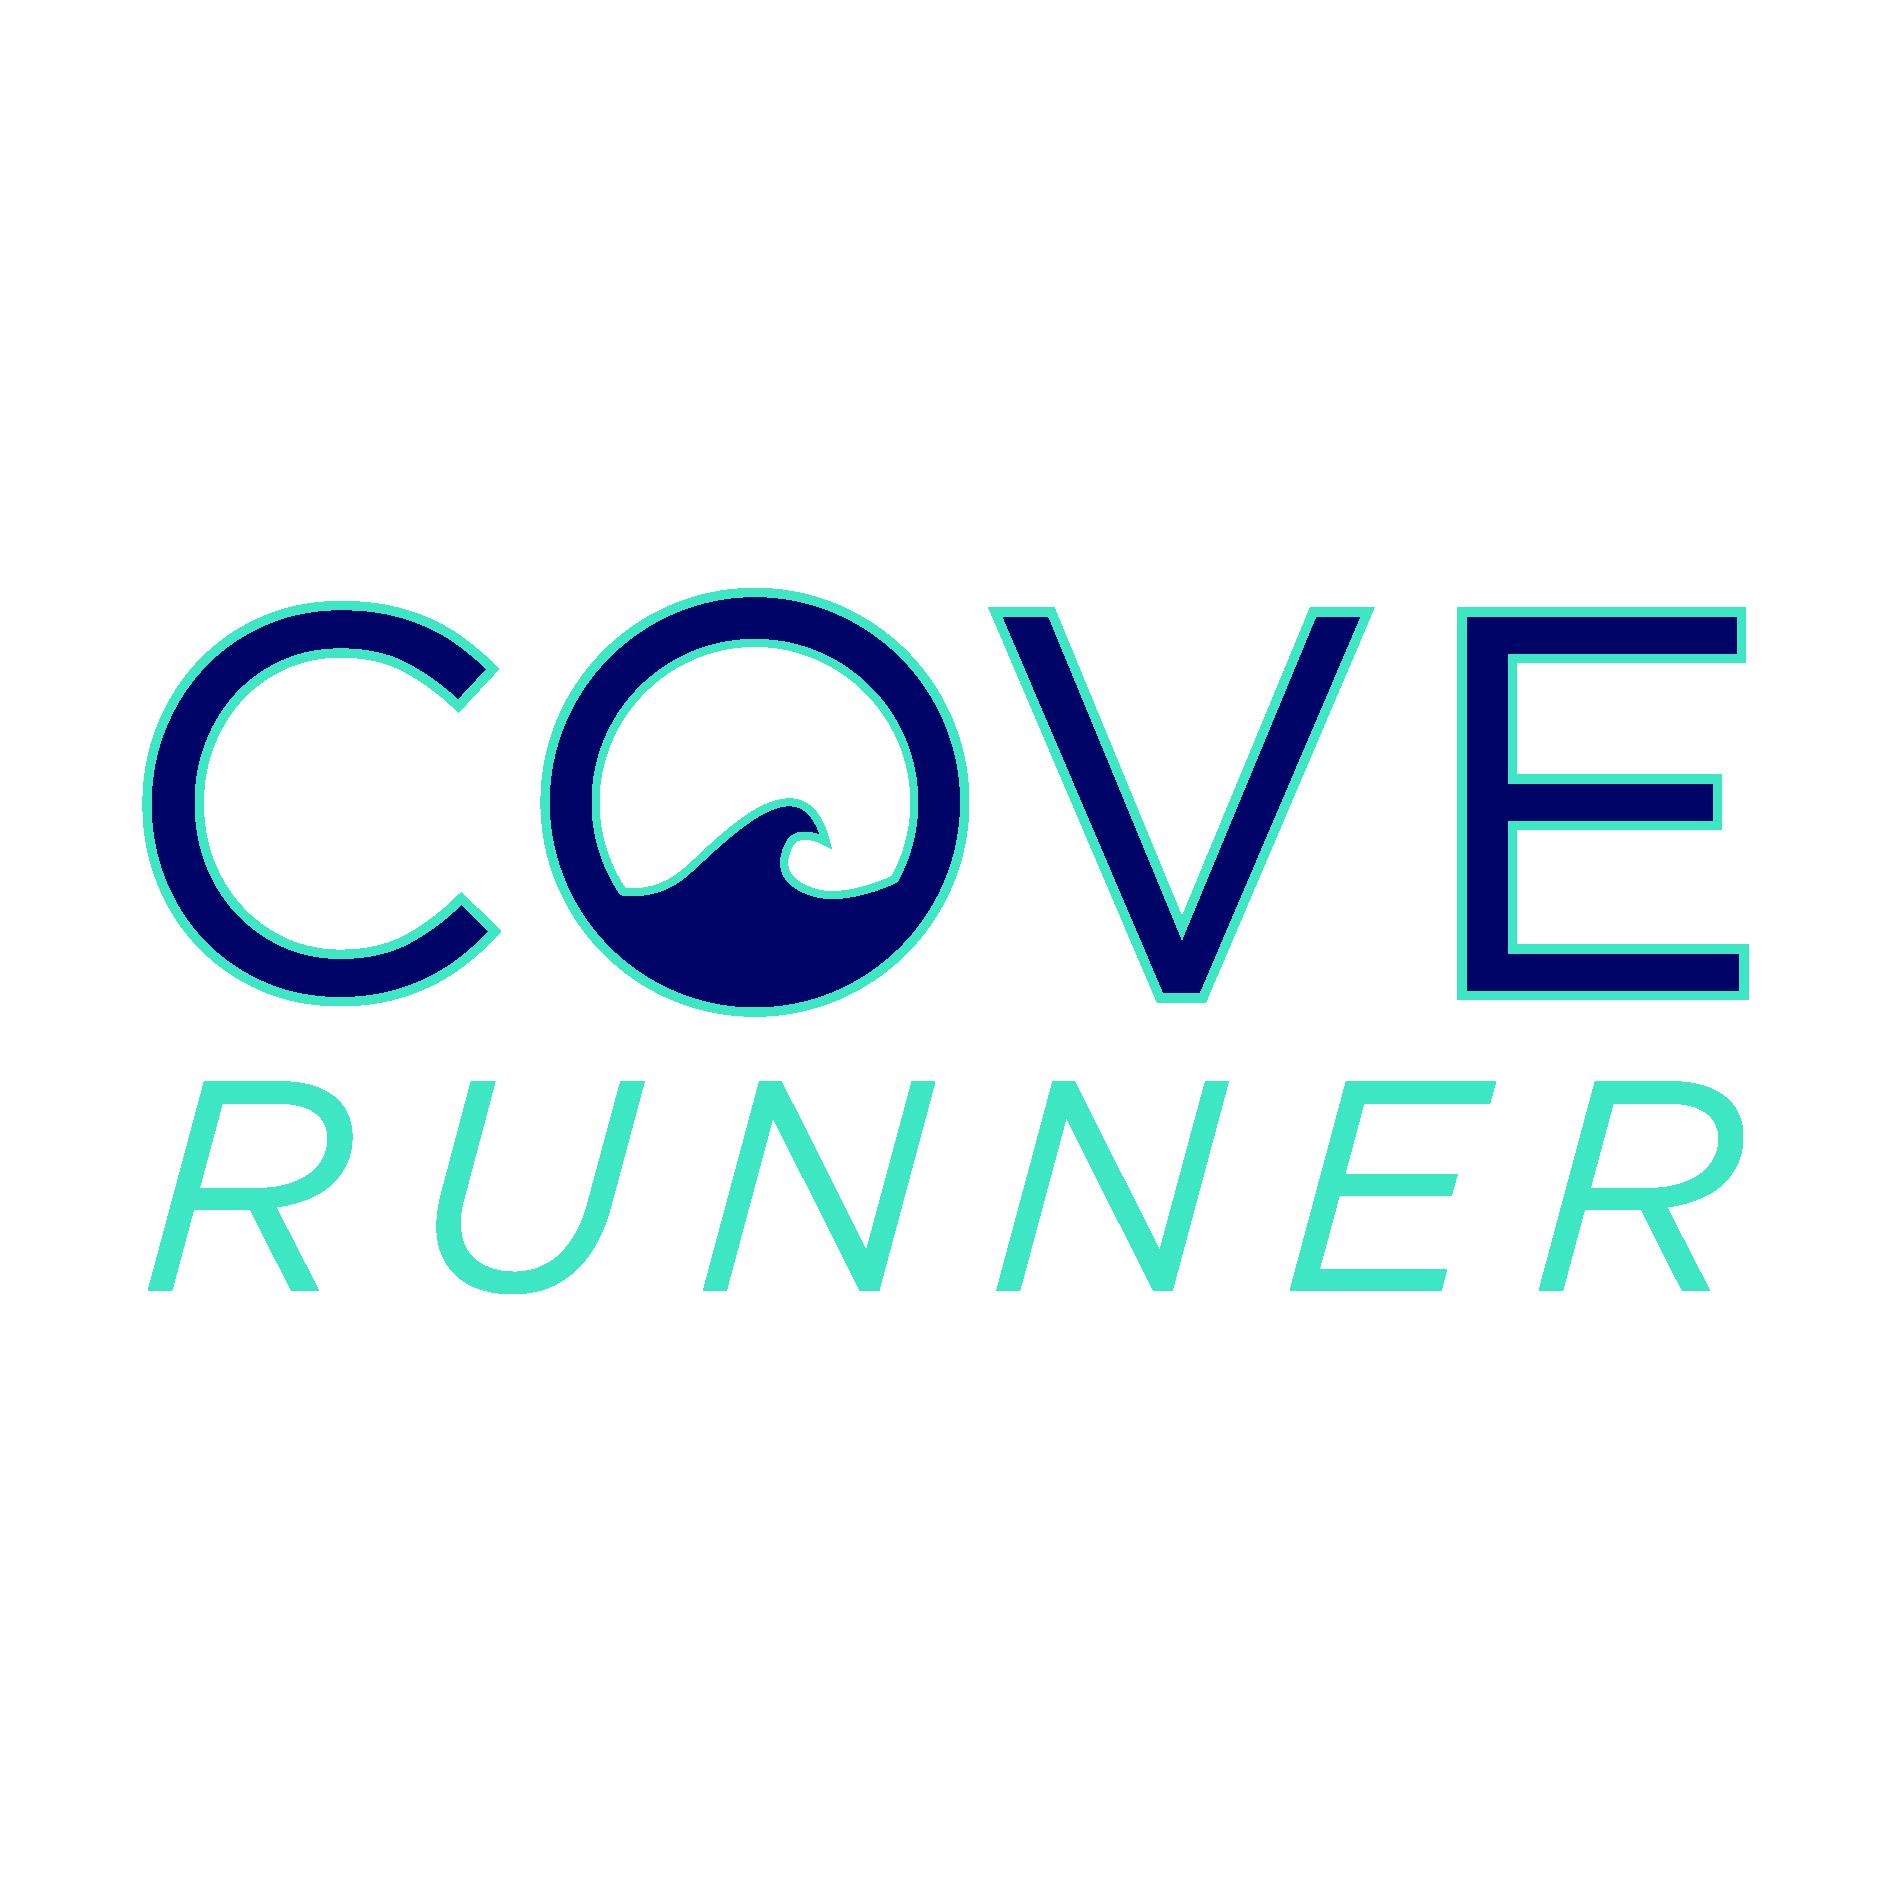 Cove Runner Logo_Vertical no Tag.jpg